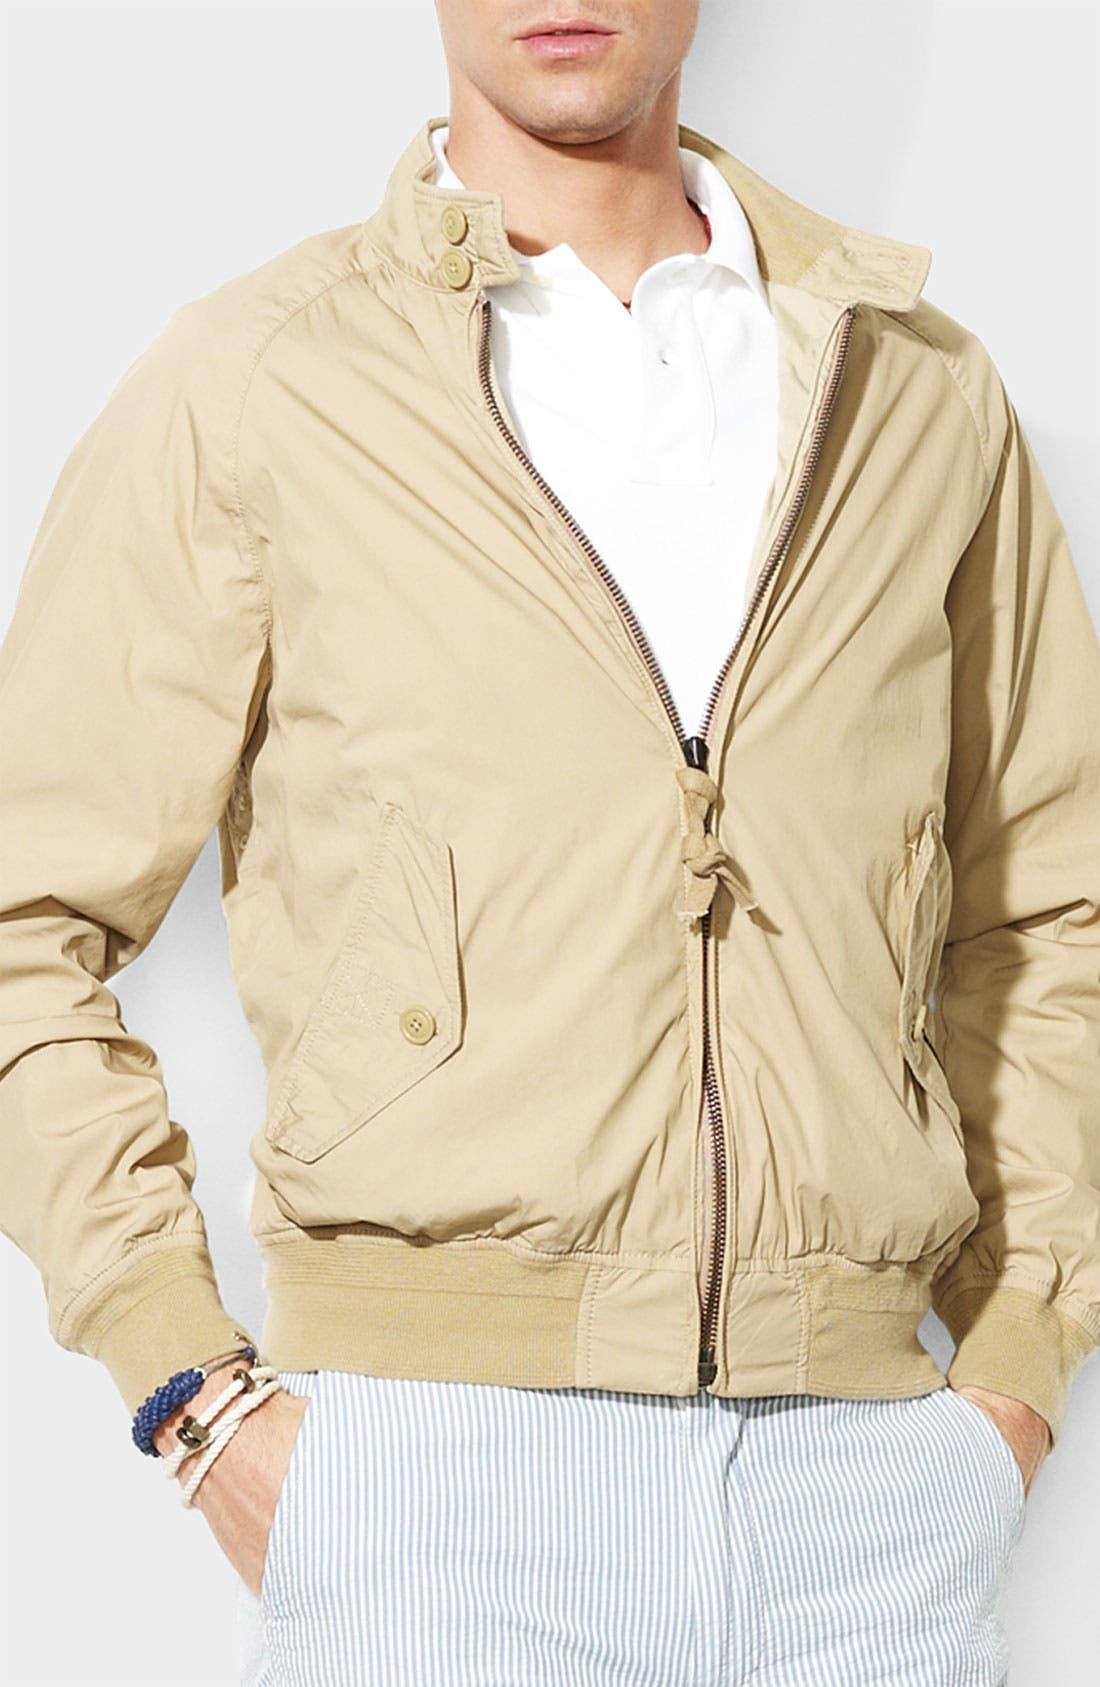 Main Image - Polo Ralph Lauren 'Barracuda' Classic Fit Jacket